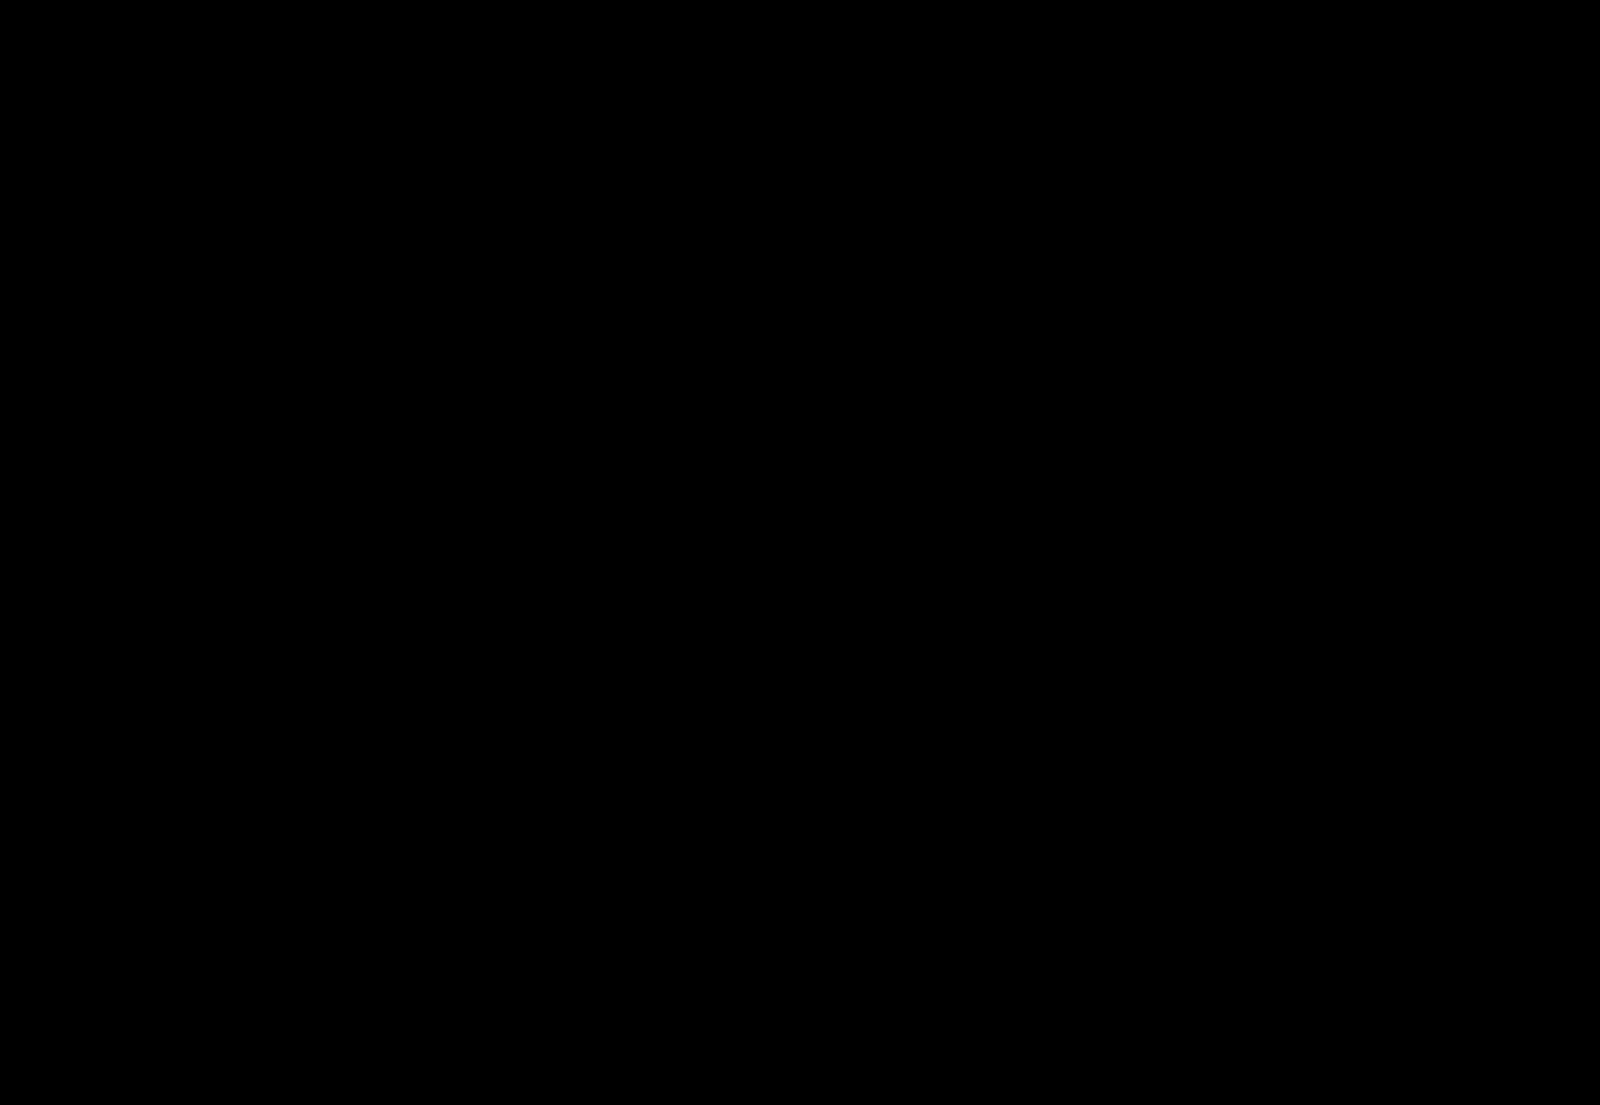 Palo Alto 06G Black wins the 2017 NorCal Gold bracket